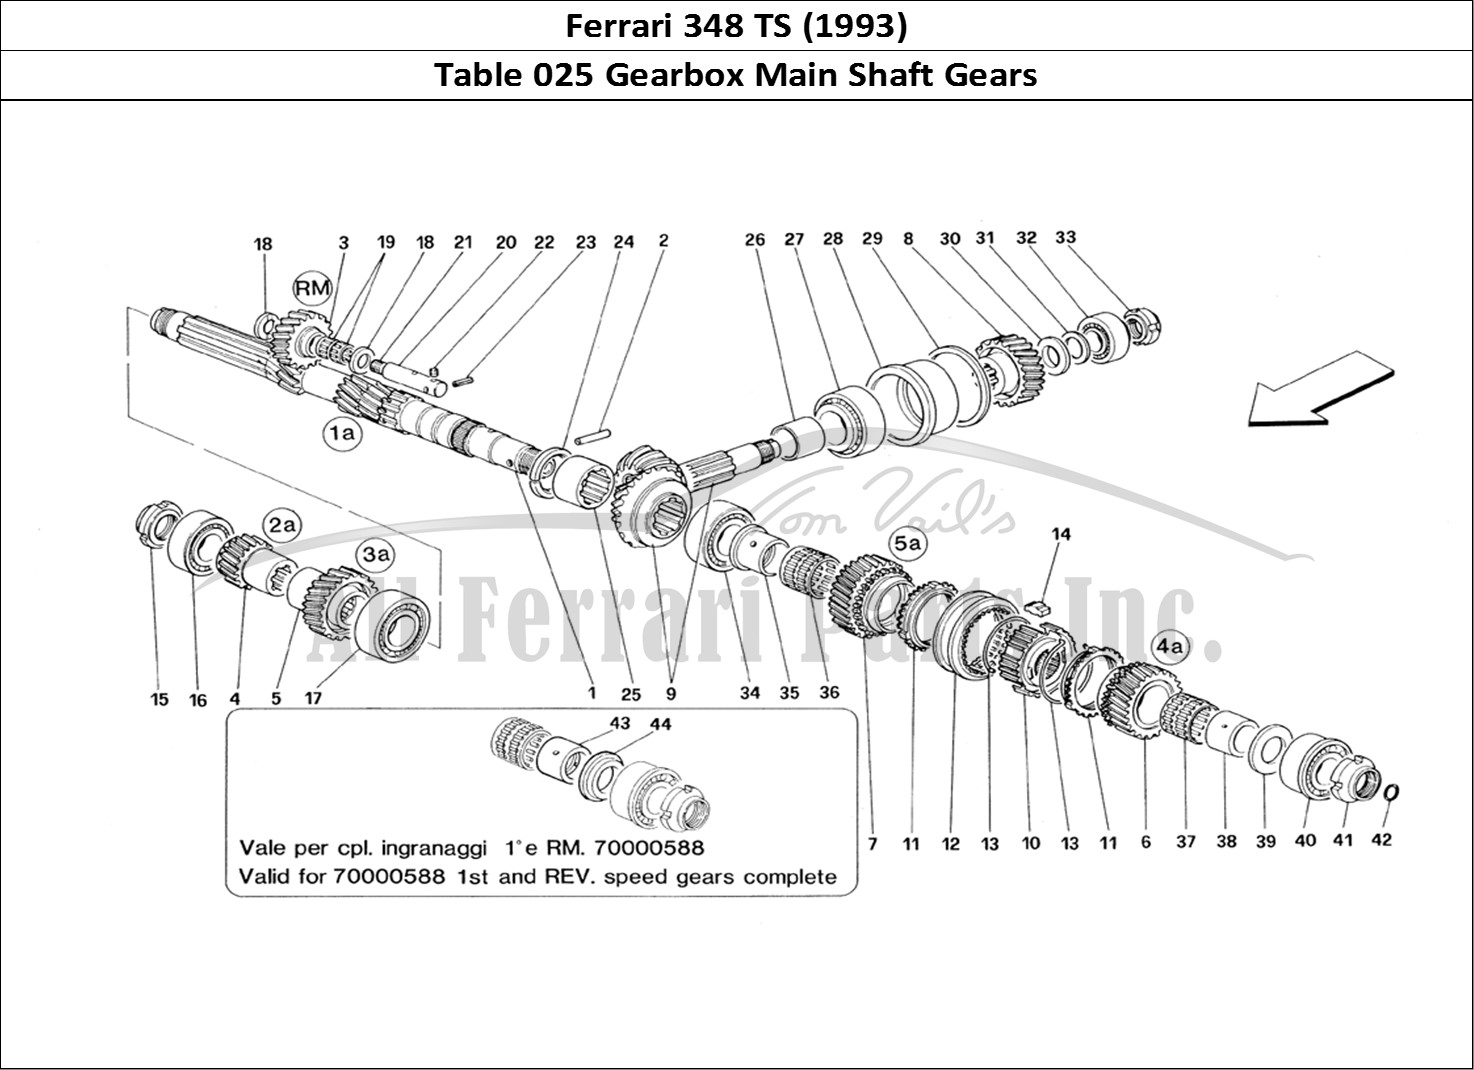 Buy original Ferrari 348 TS (1993) 025 Gearbox Main Shaft